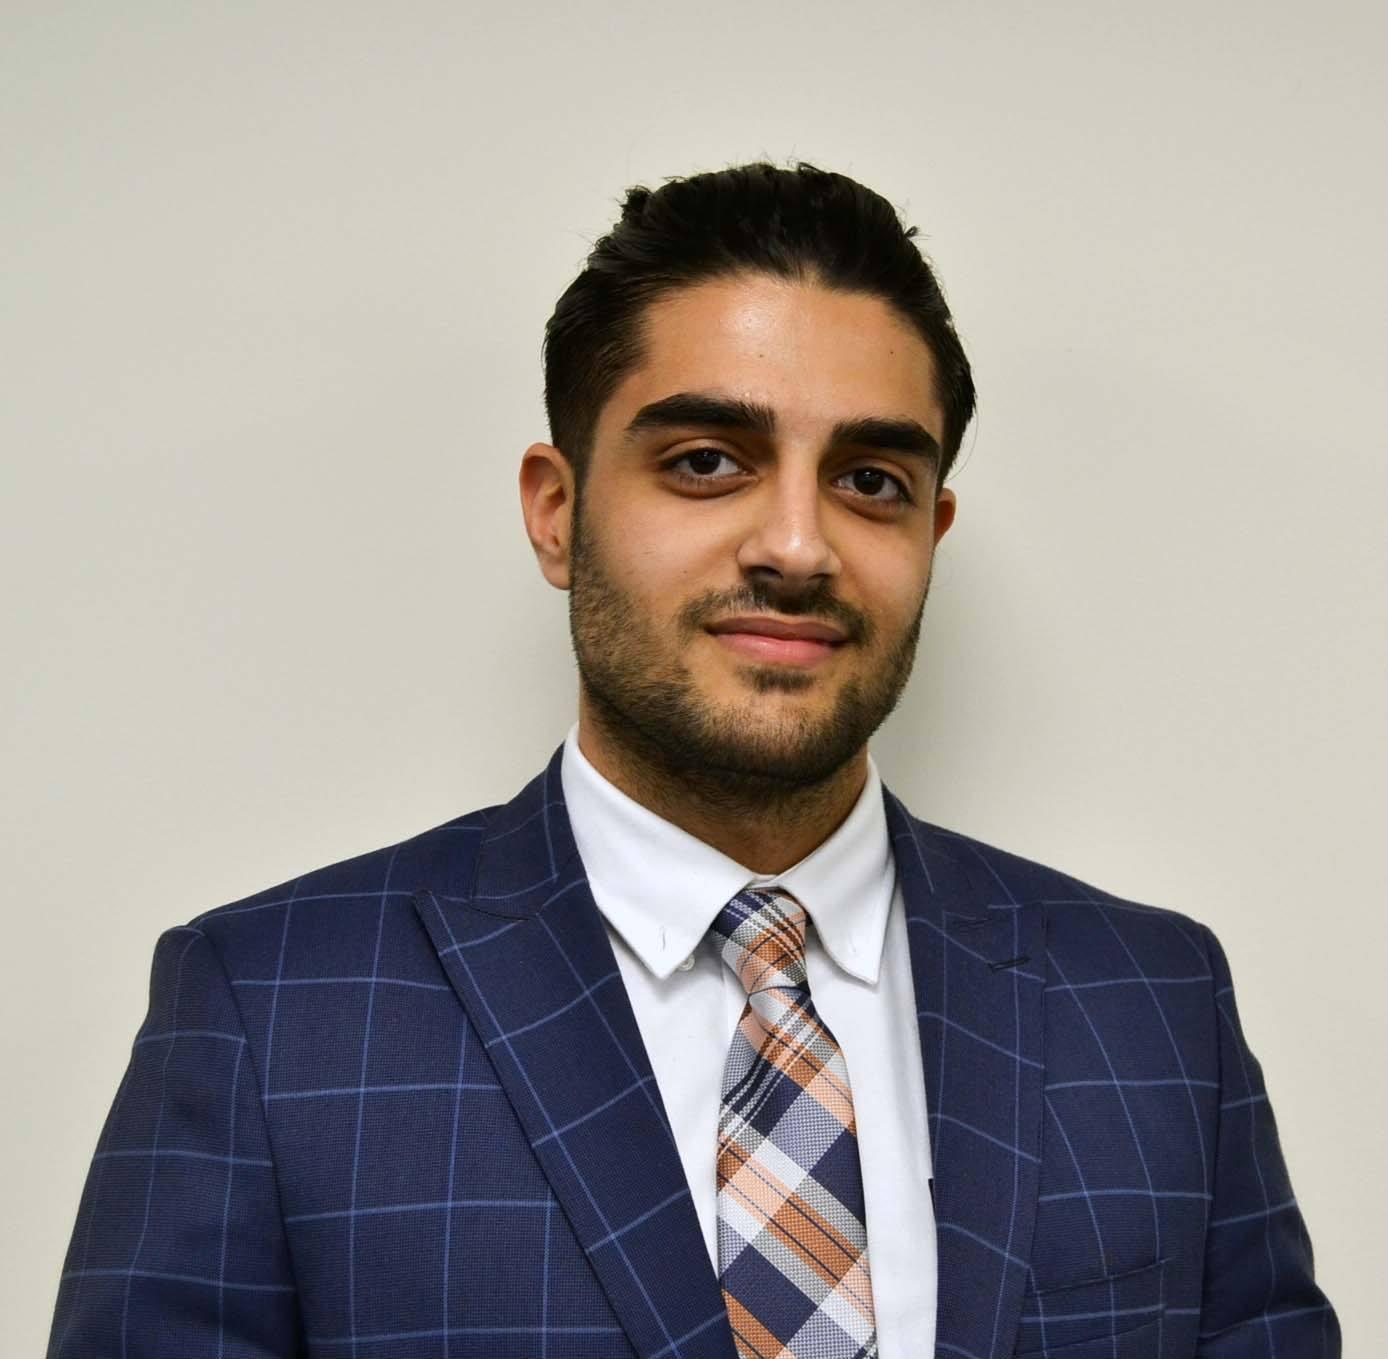 Arash  Poorehssan